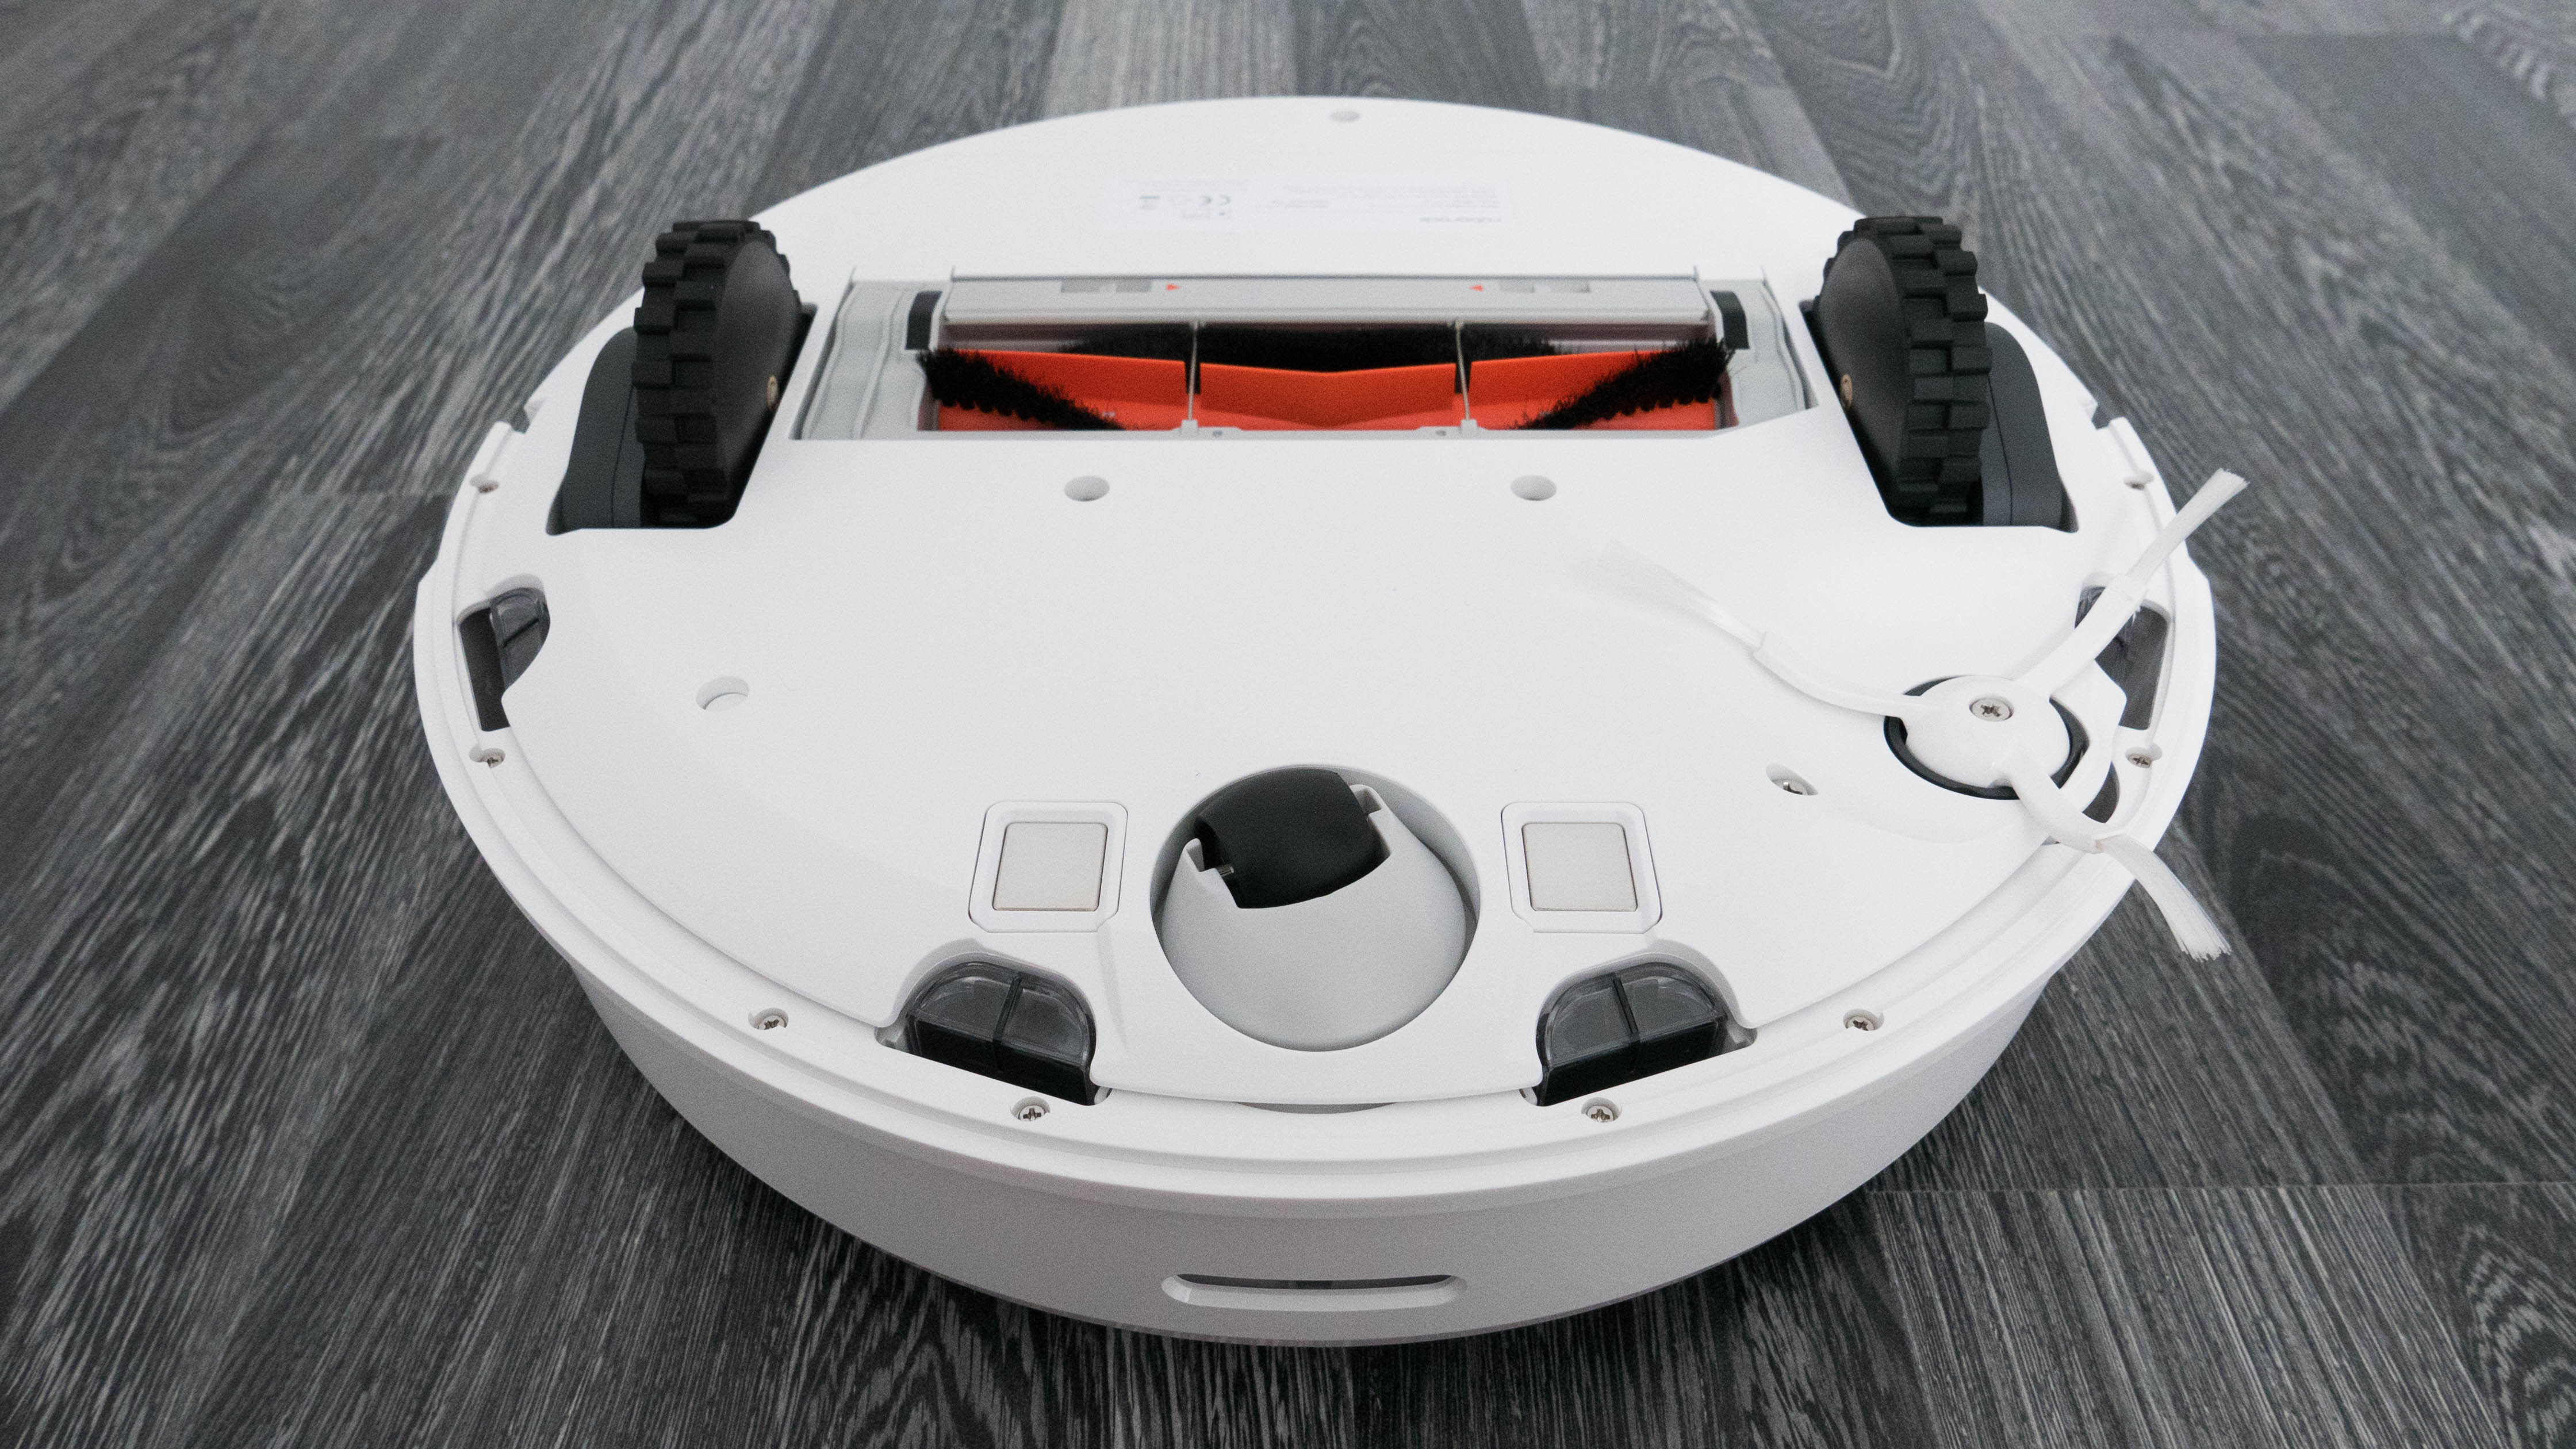 Xiaomi Mi Robot 2 Roborock S50 Roboter Details 31